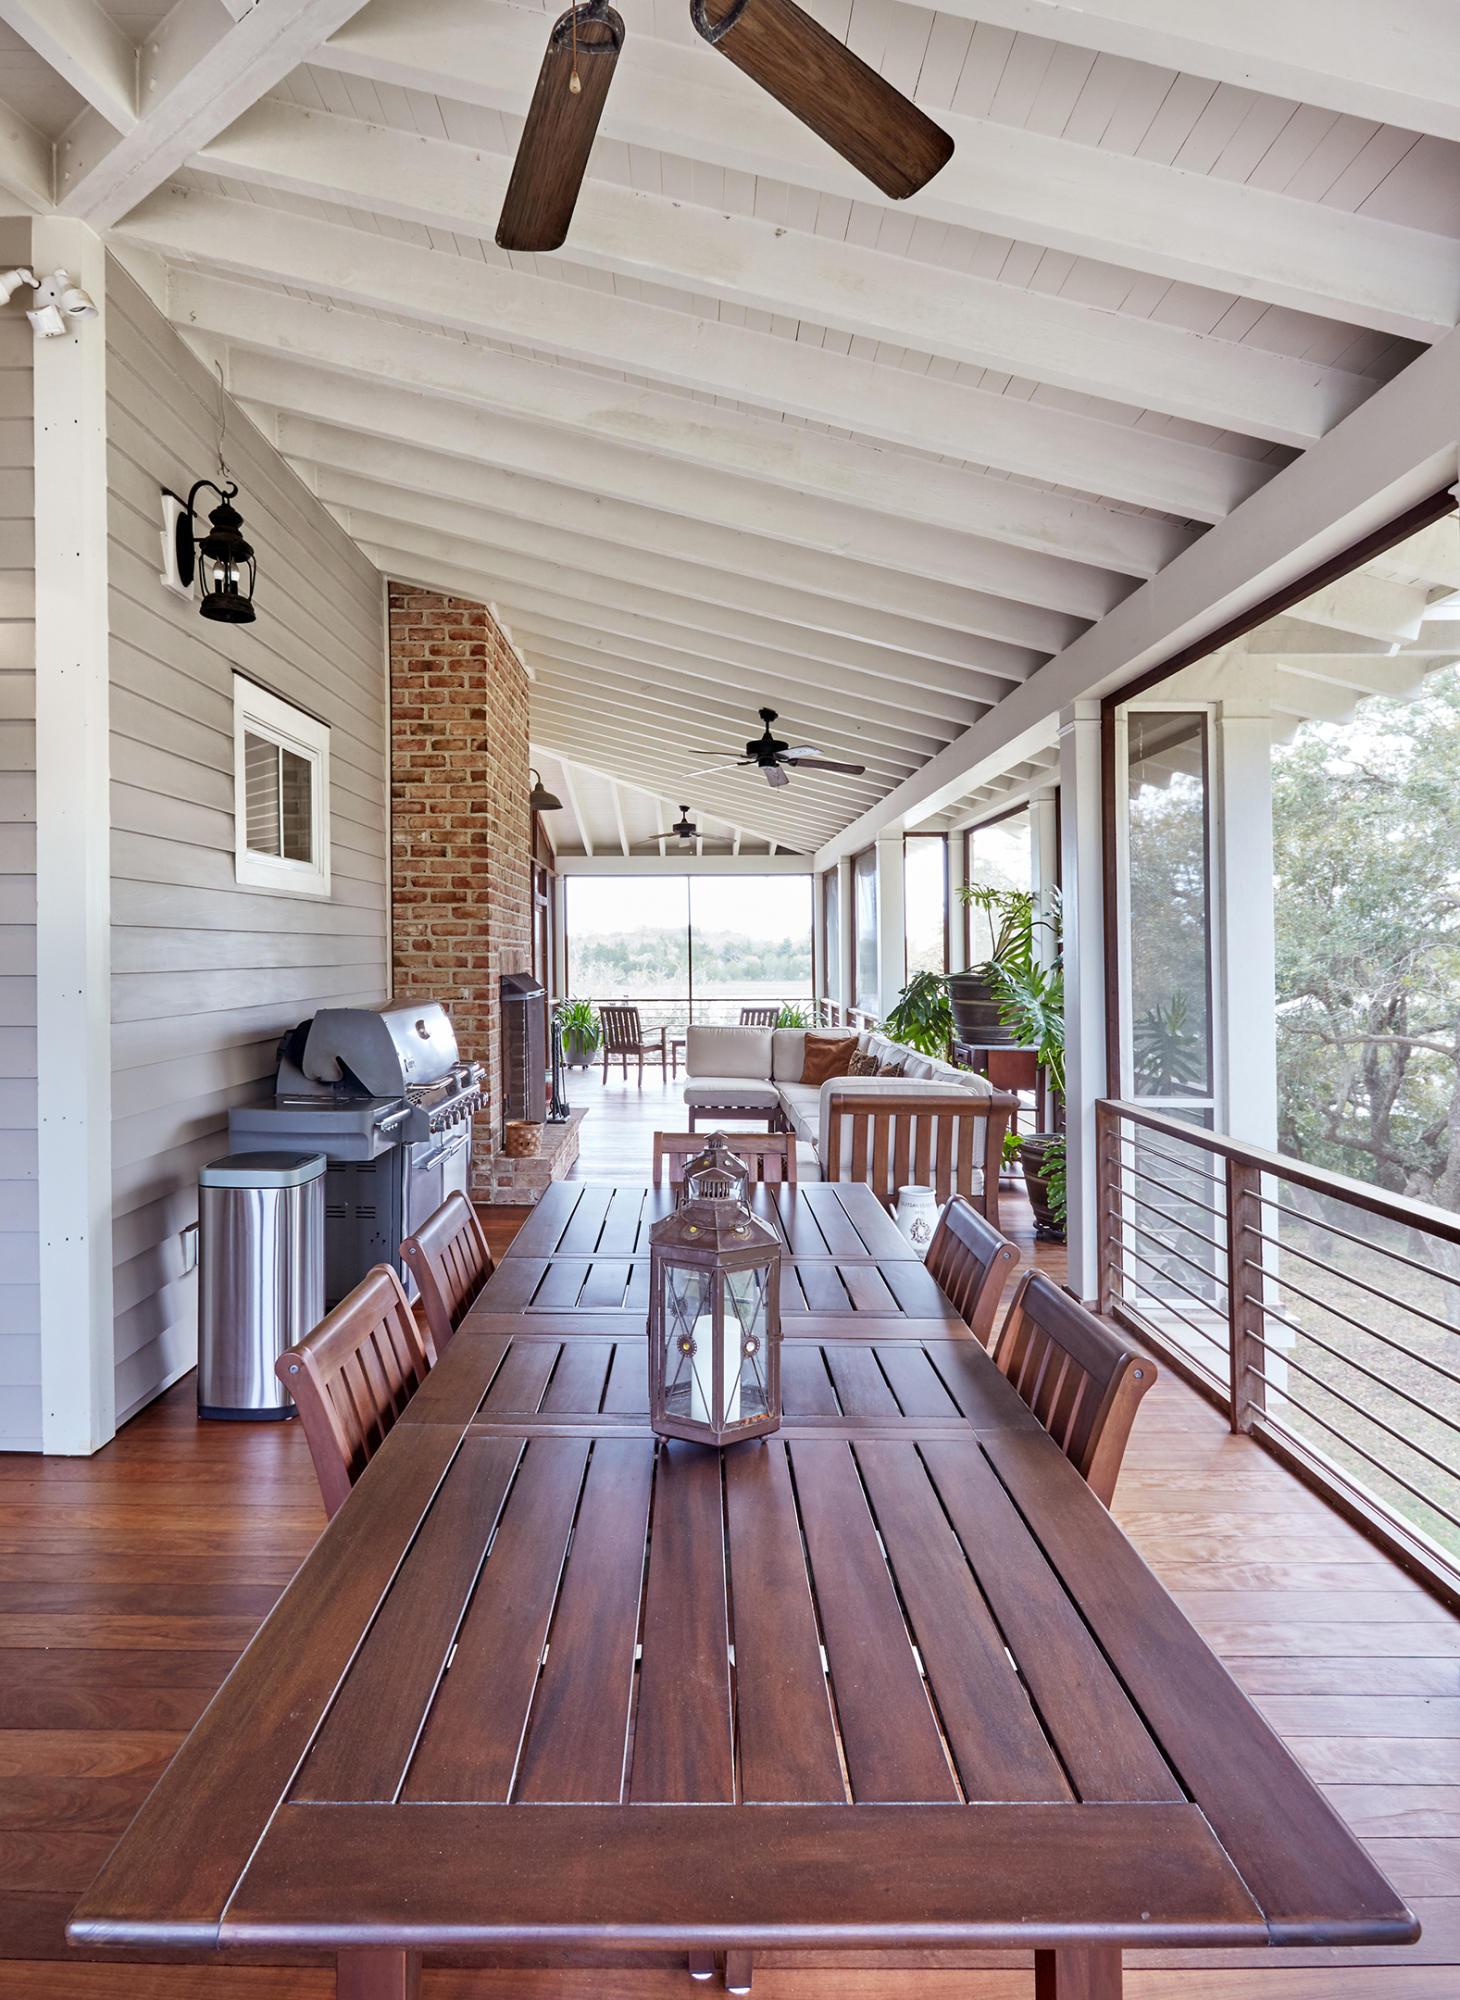 White Stalls Pt Jackson Homes For Sale - 625 Hall, Awendaw, SC - 4